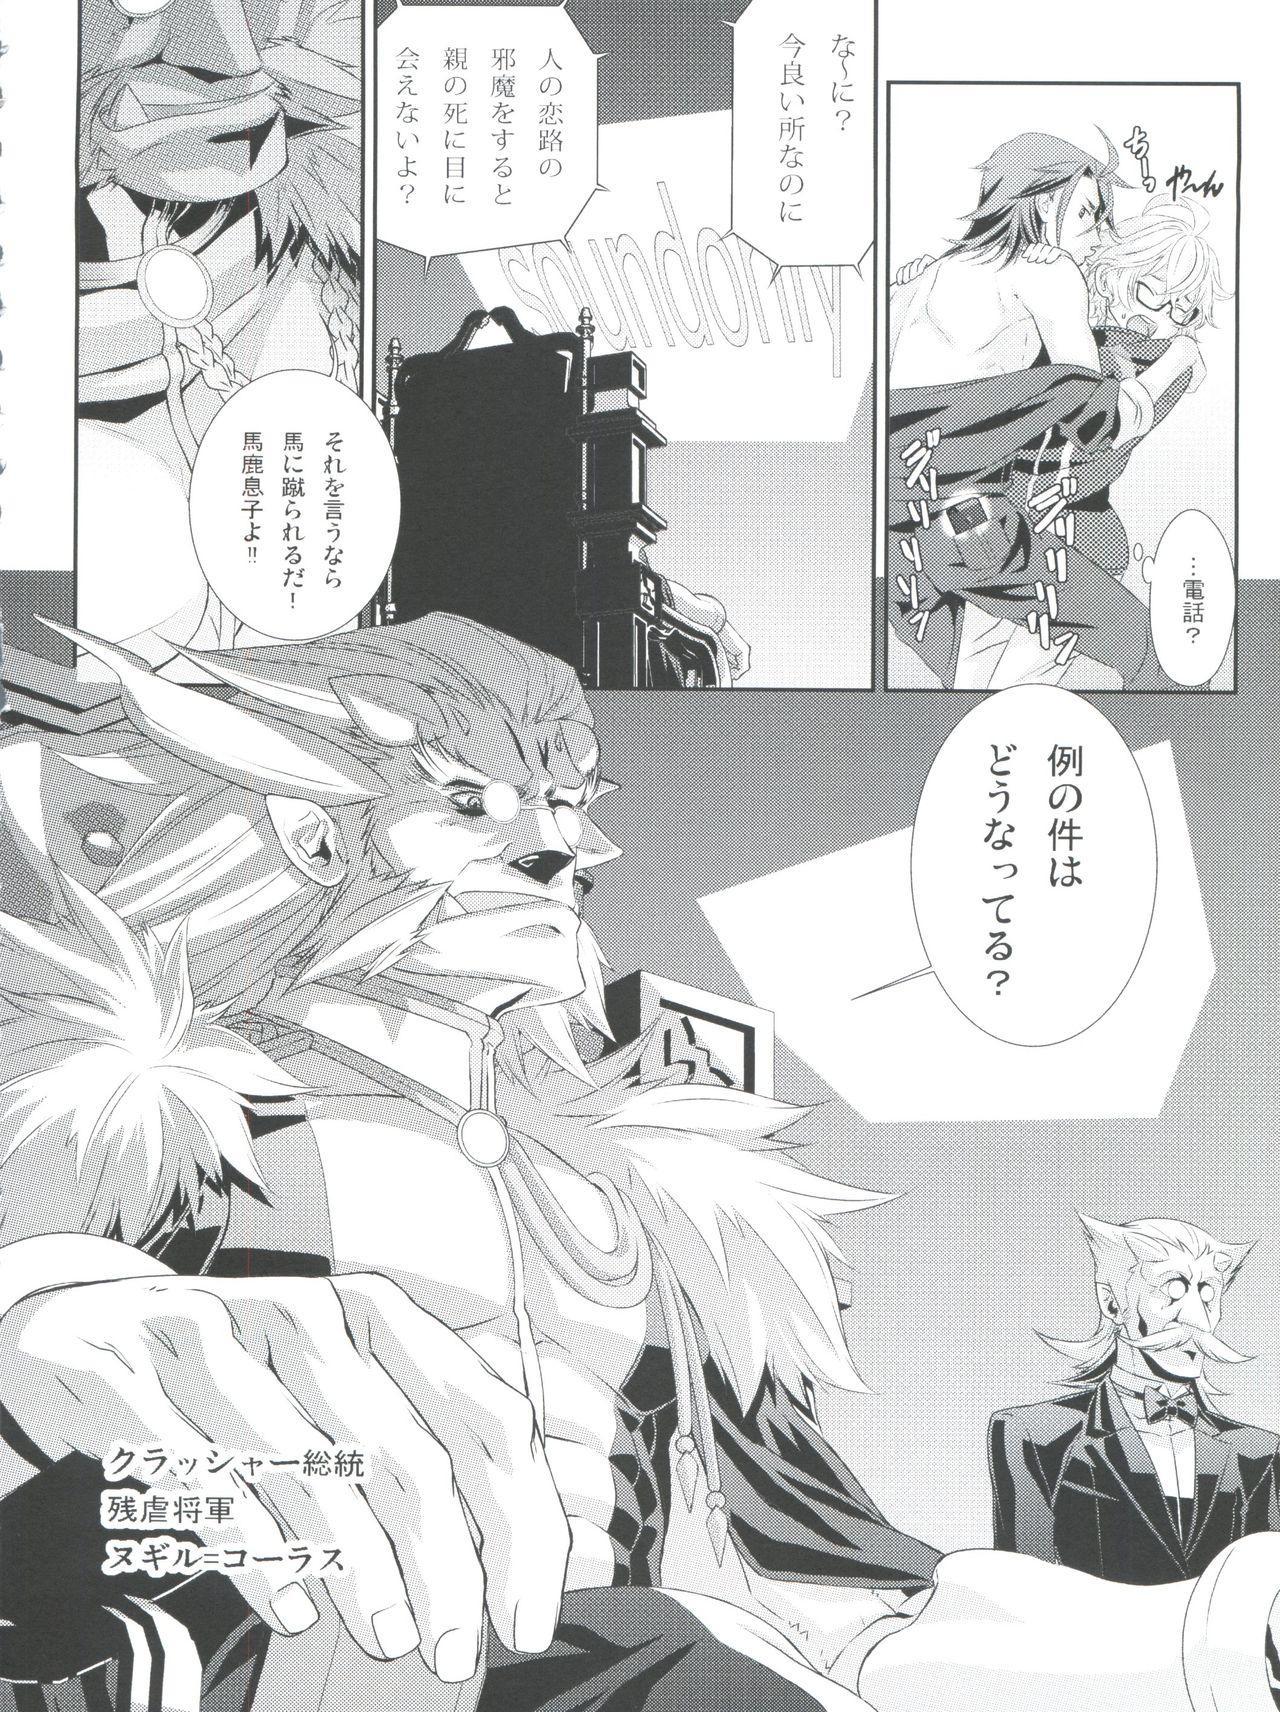 Shounen Maid Curo-kun vs Buraidau Hen Gaiden 23